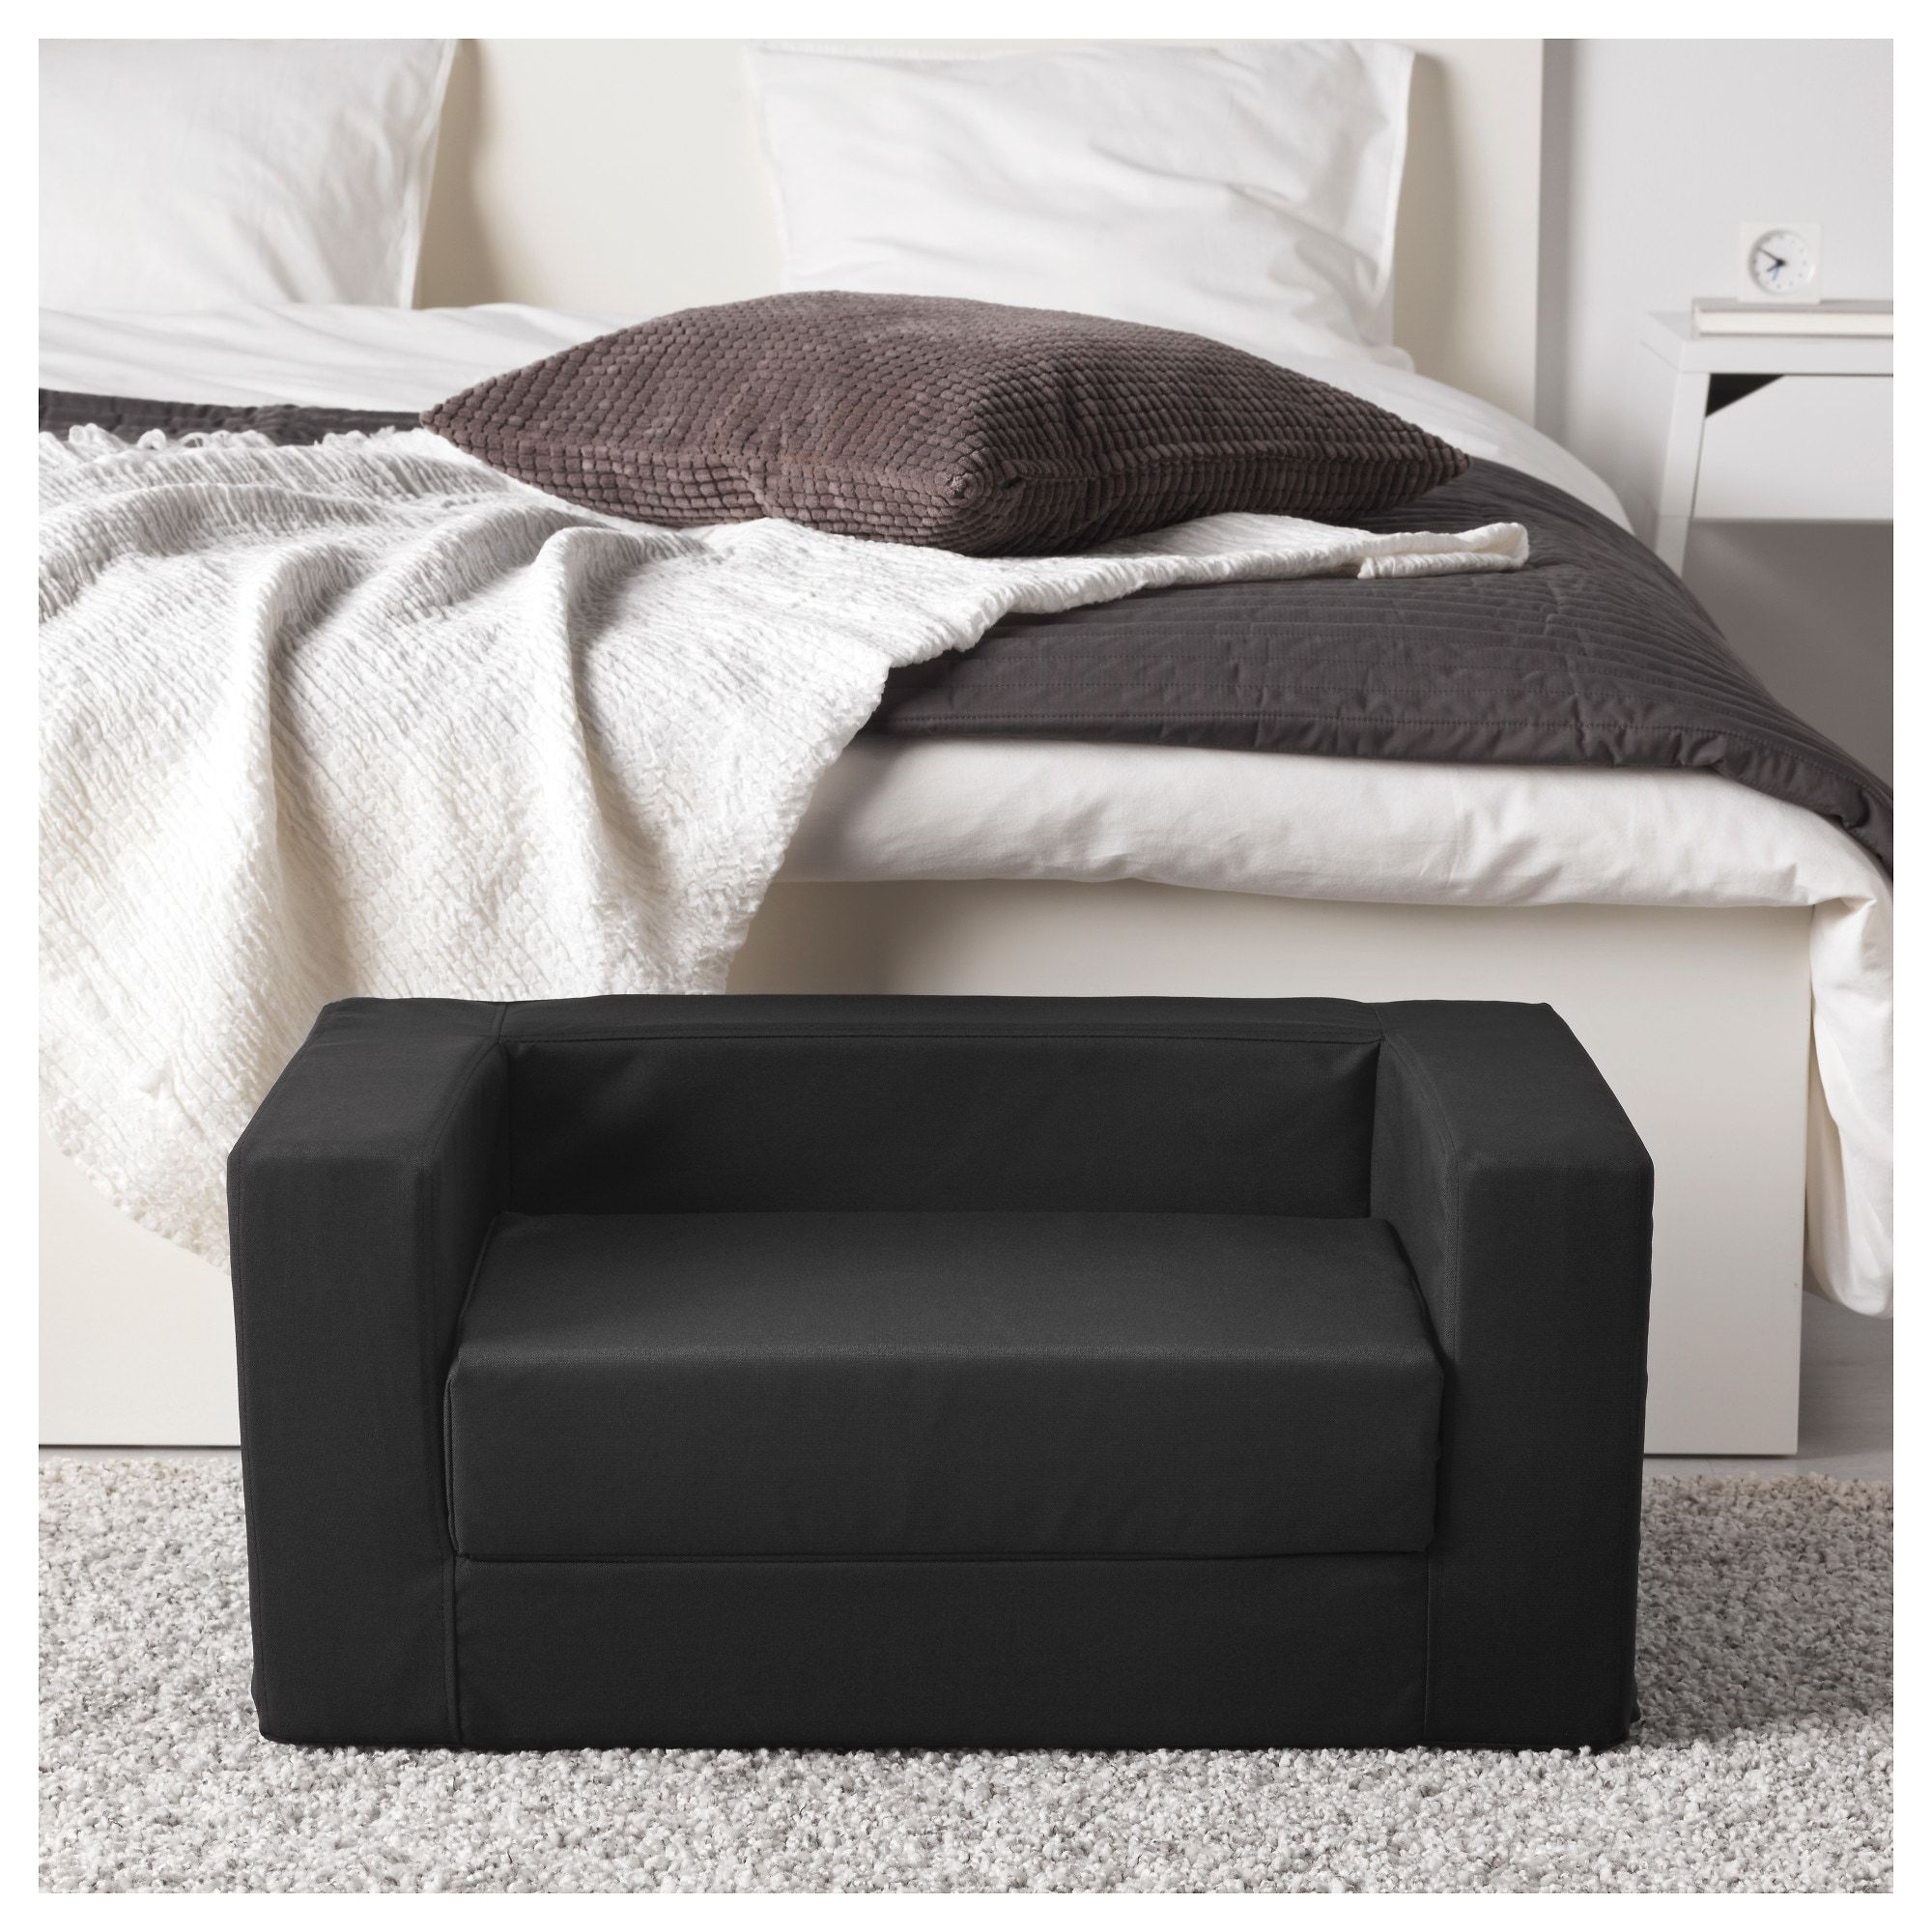 Peachy Ikea Lurvig Cat Dog Bed Black In 2019 Dog Bed Black Machost Co Dining Chair Design Ideas Machostcouk